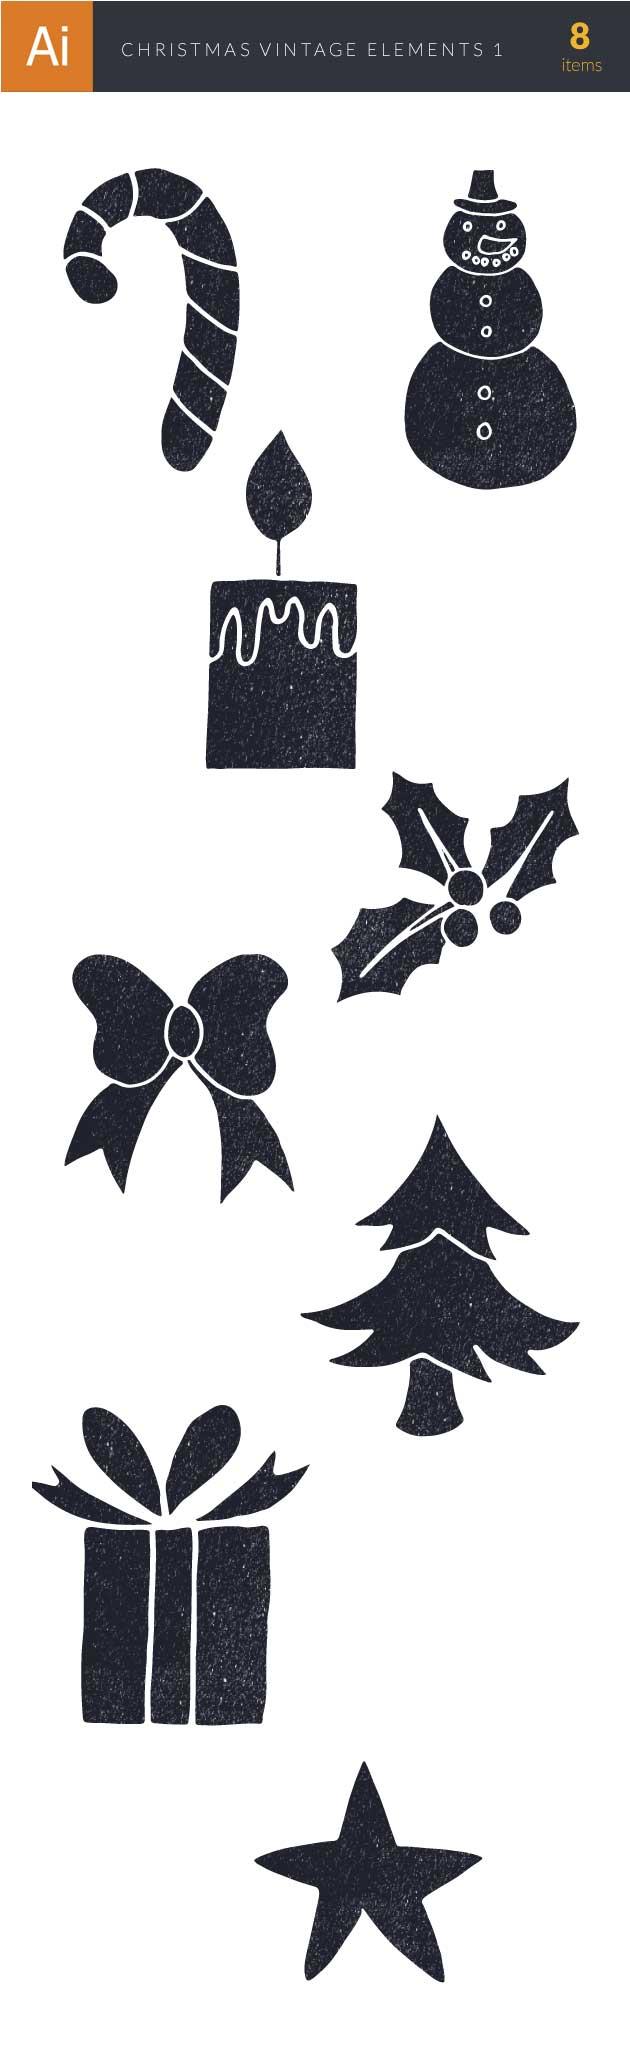 Christmas Day Elements Vector Set 1 designtnt christmas day elements set 1 vector large